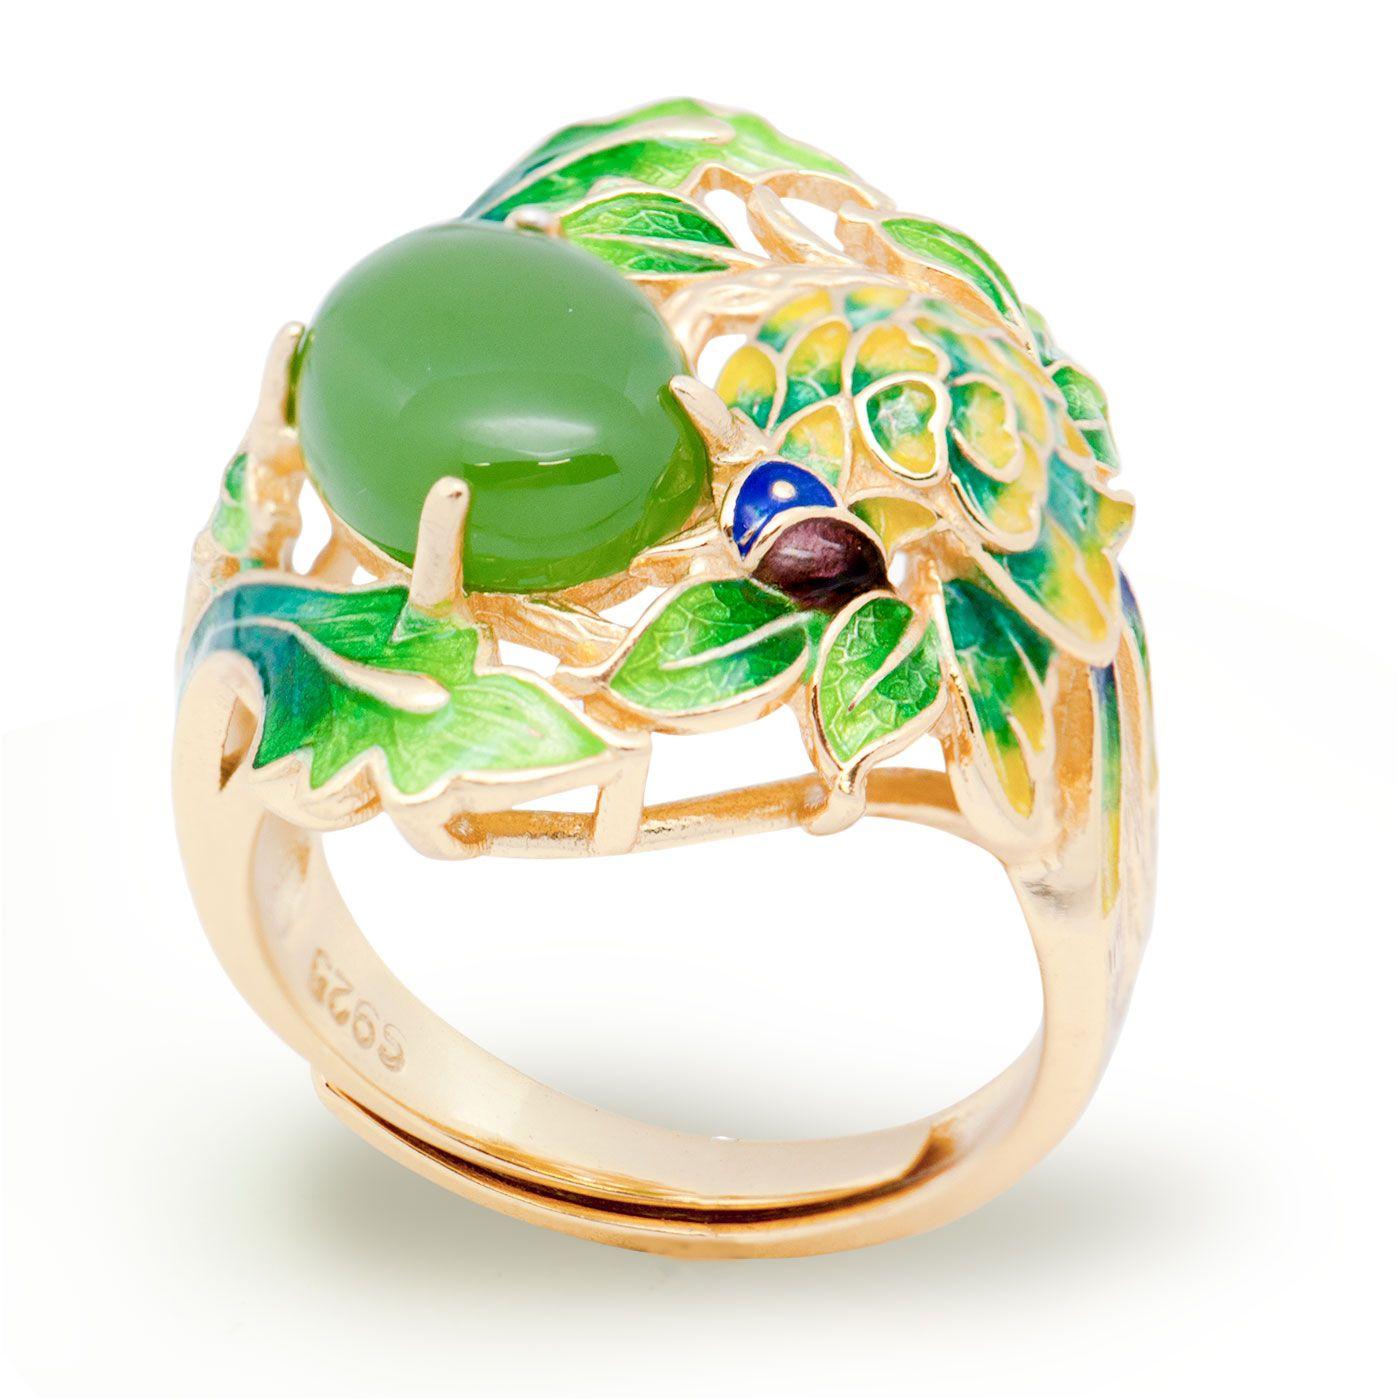 Esmalte verde Jasper flor hoja 925 Plata de Ley ajustable anillo de oro